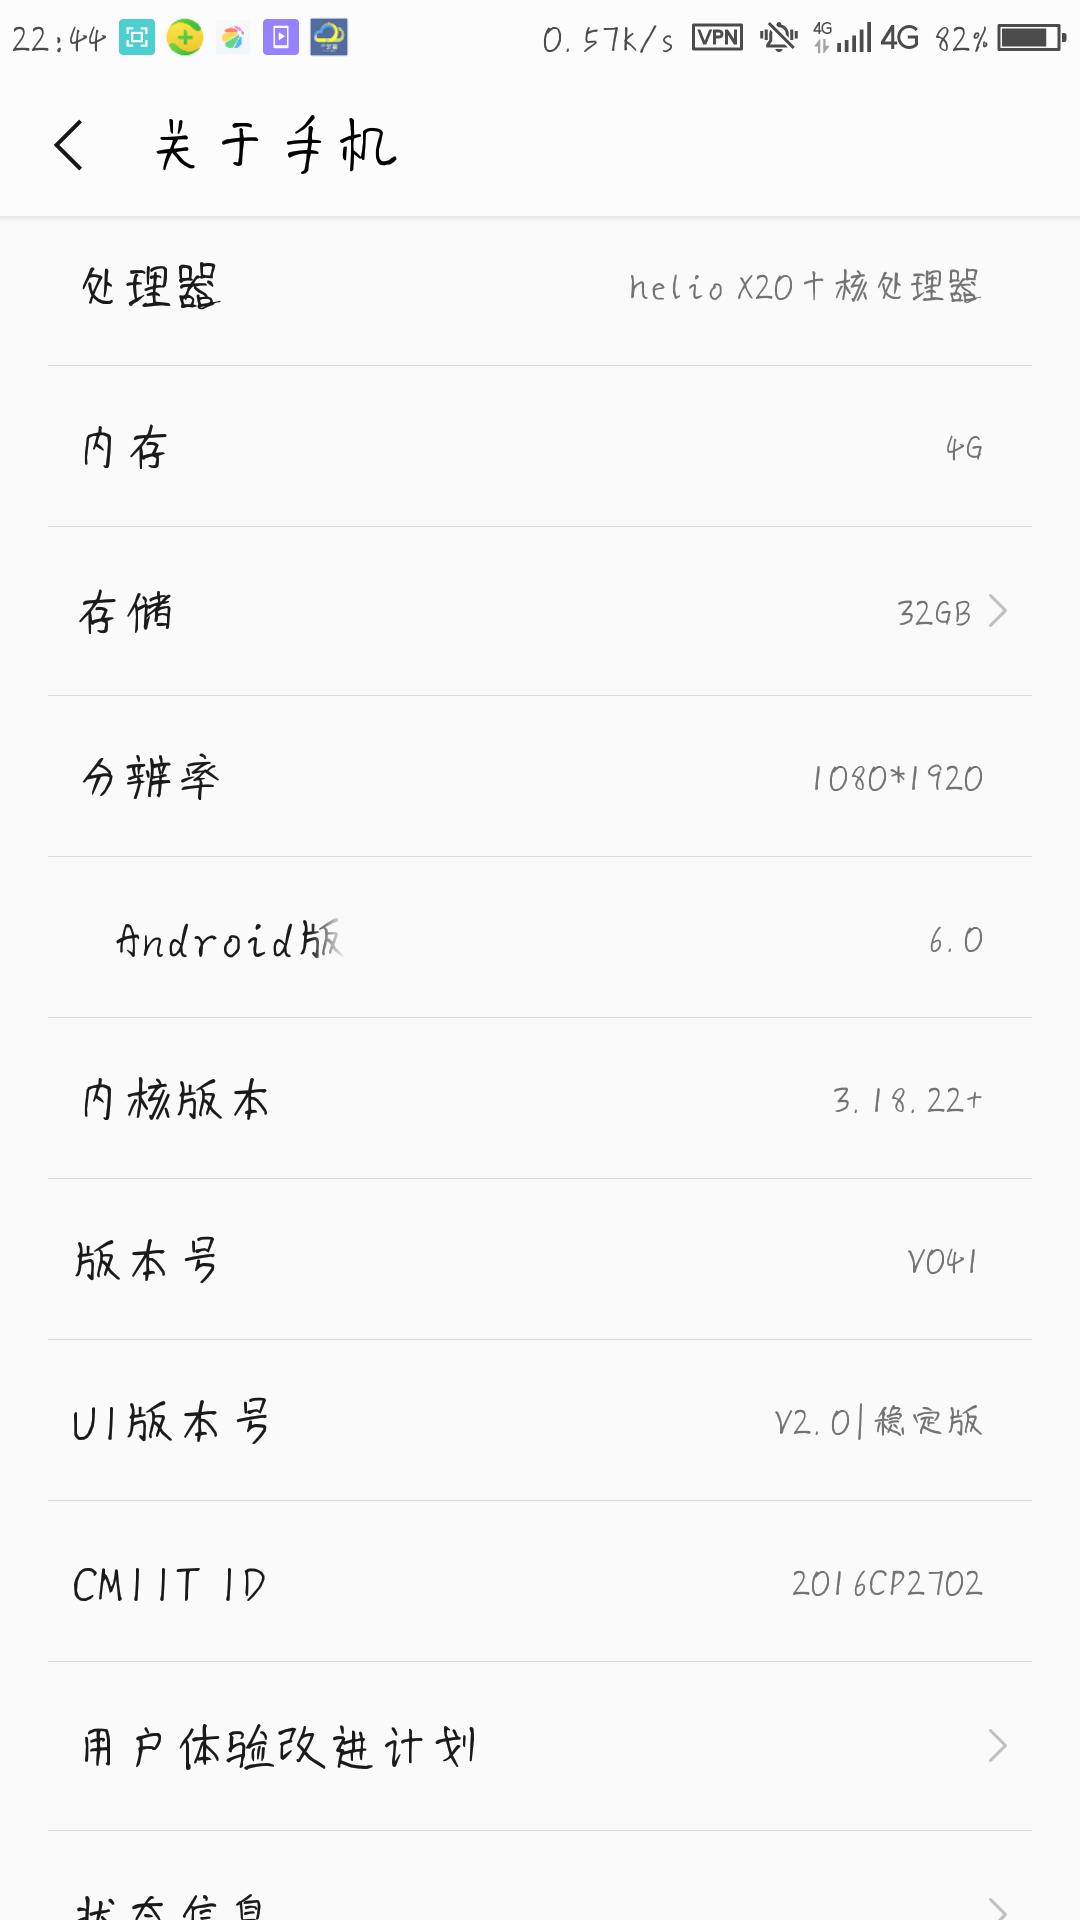 Screenshot_2016-10-23-22-44-22.png